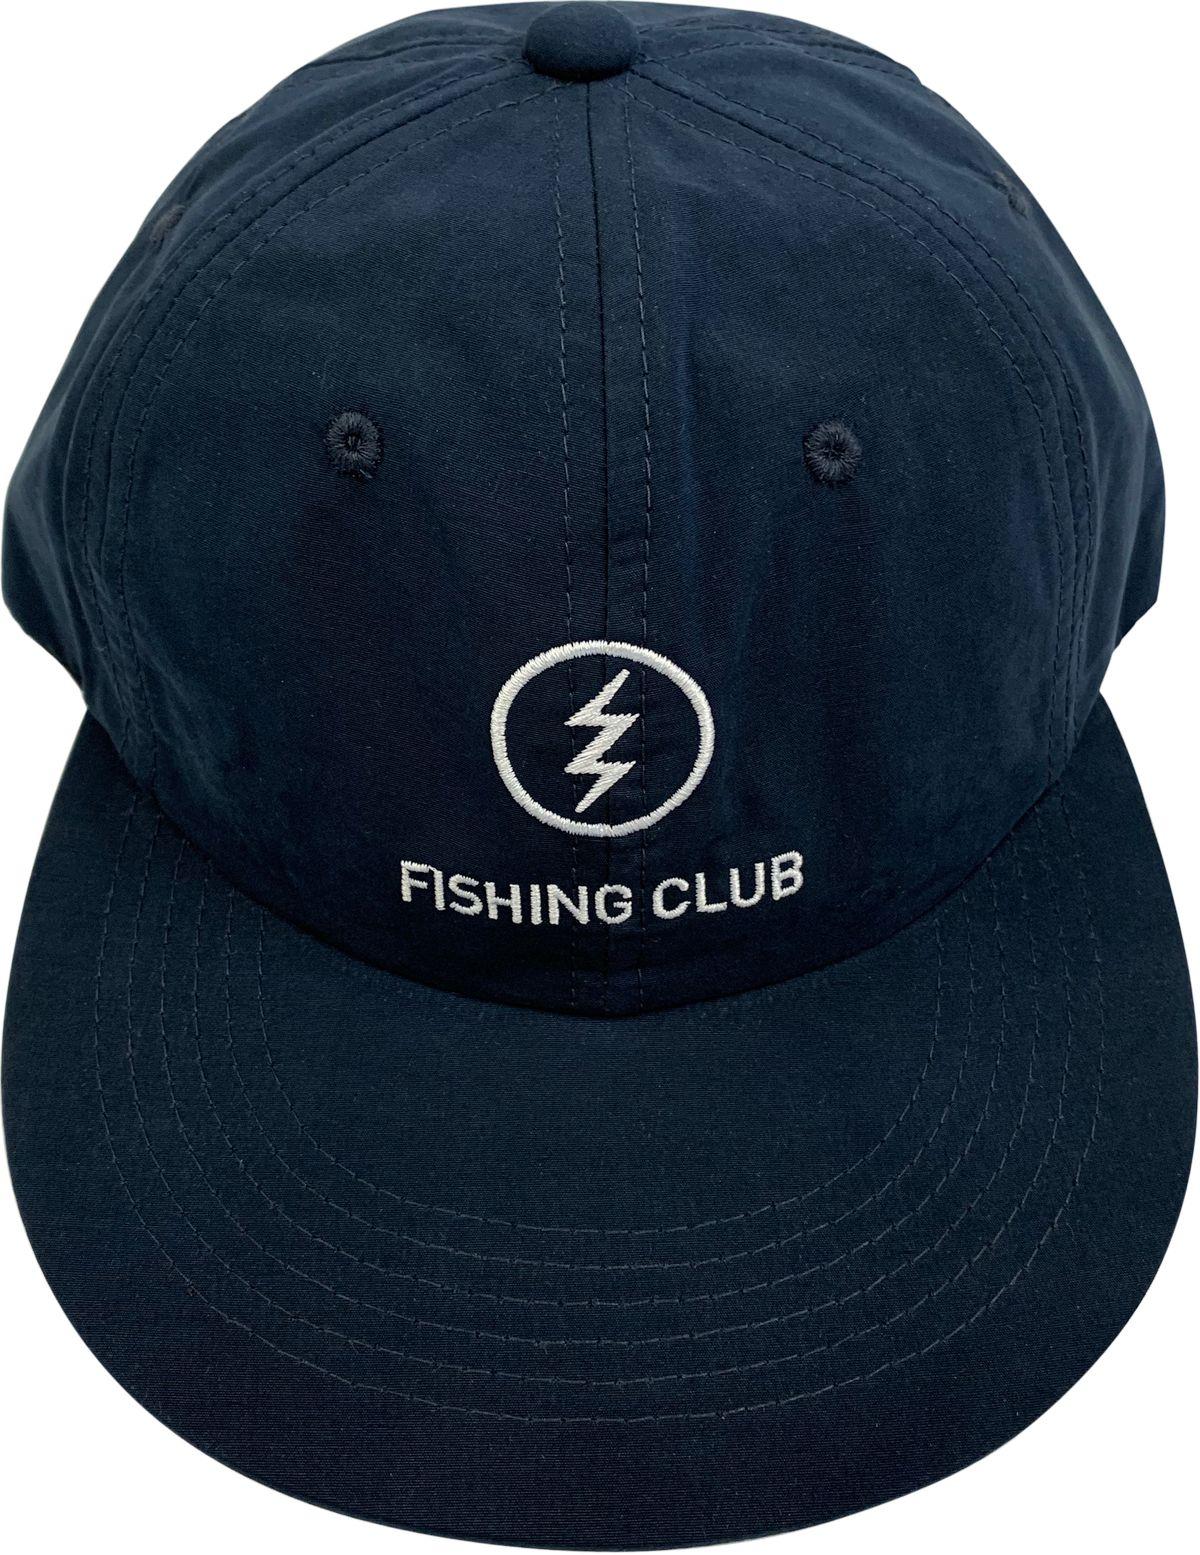 fishing_club_cap2